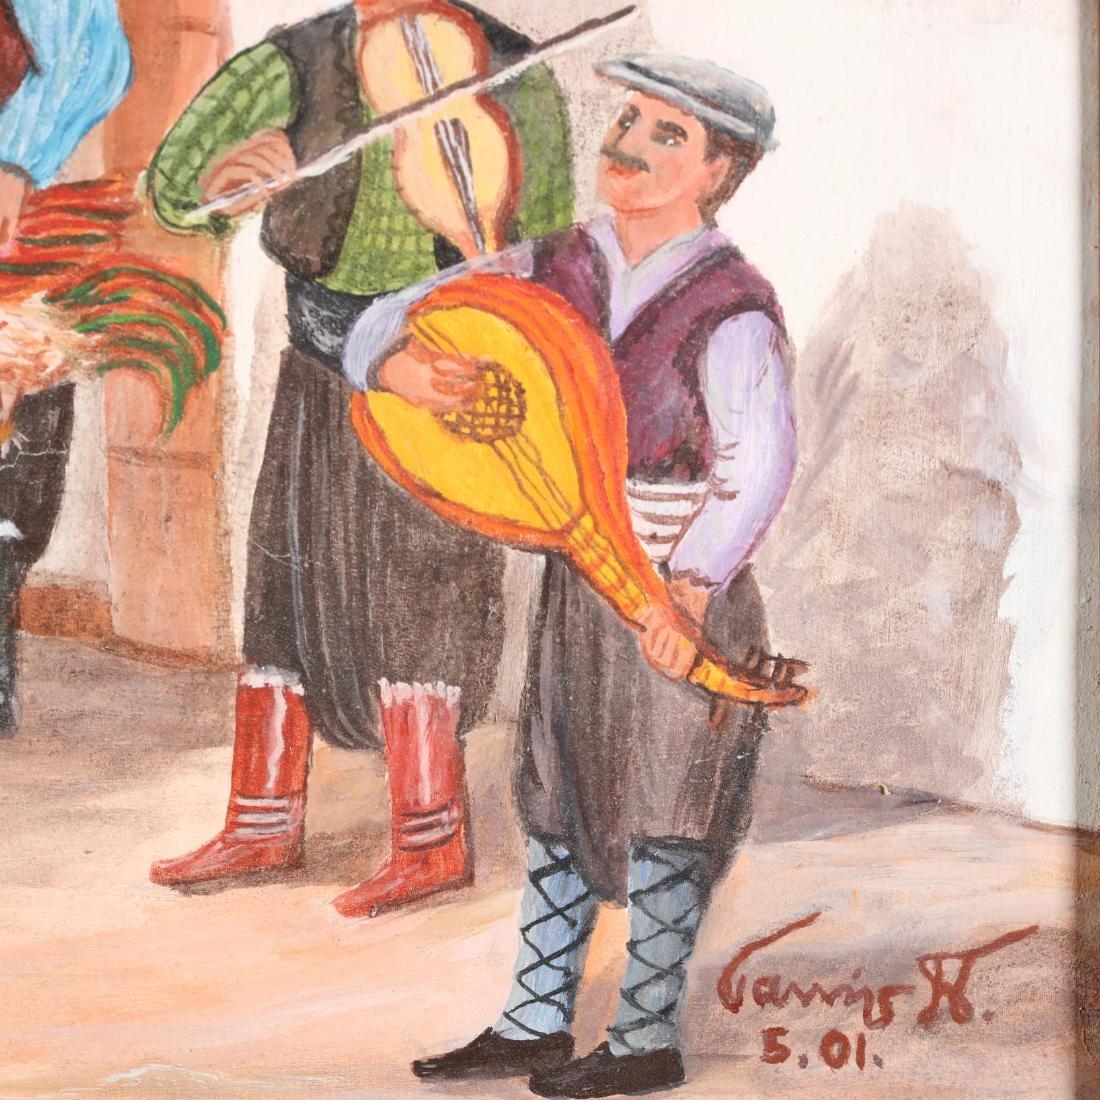 Yiannis Pelekanos (Cypriot, b. 1937), A Musical Village - 2